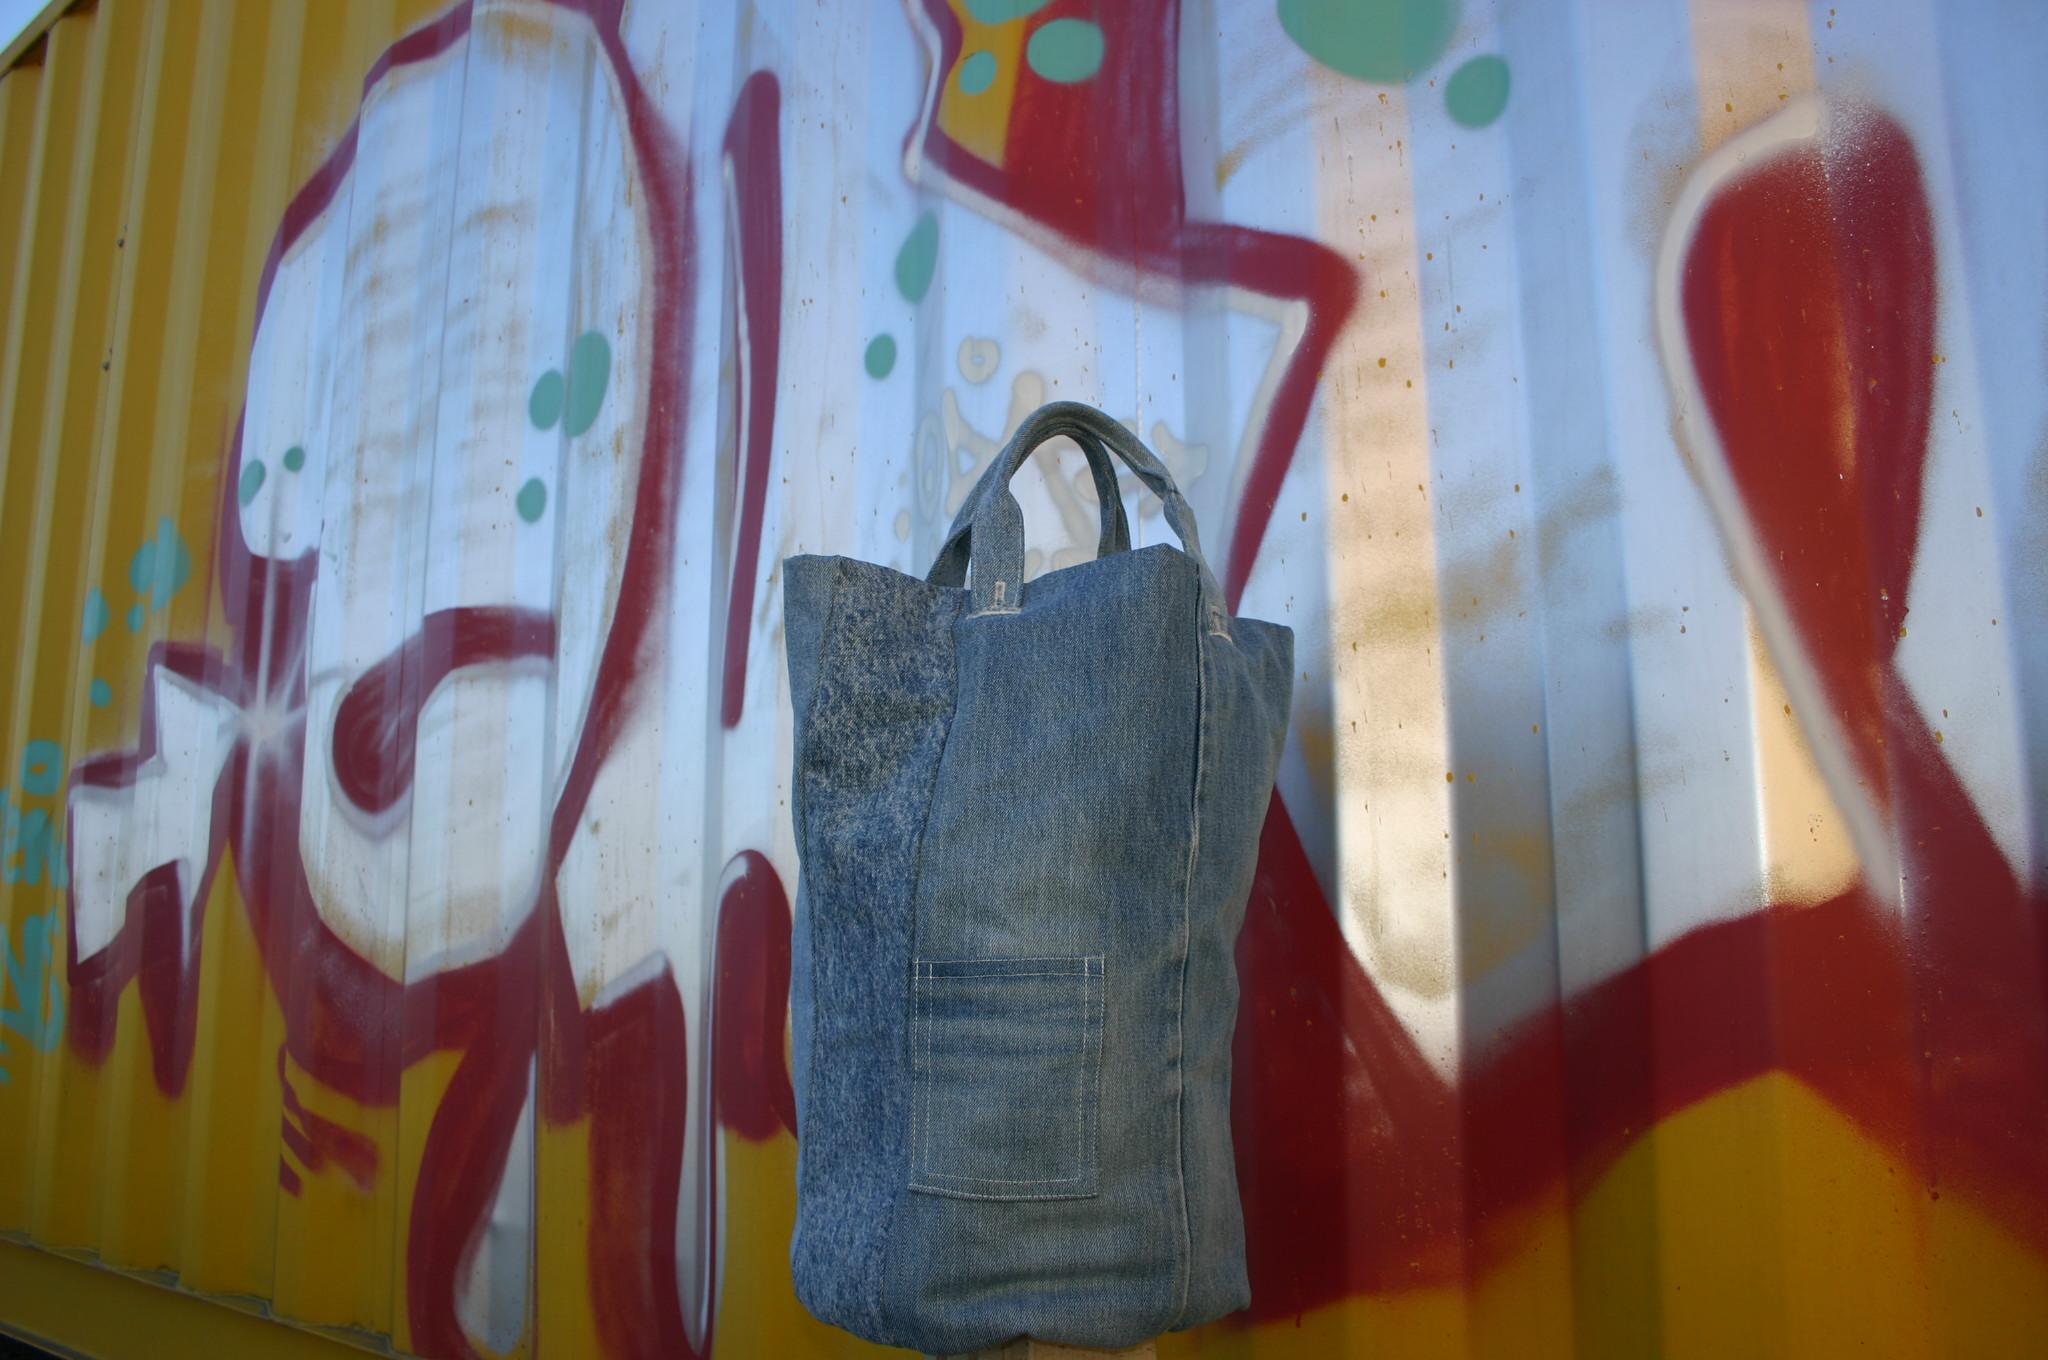 diy denim round bag with removable handles